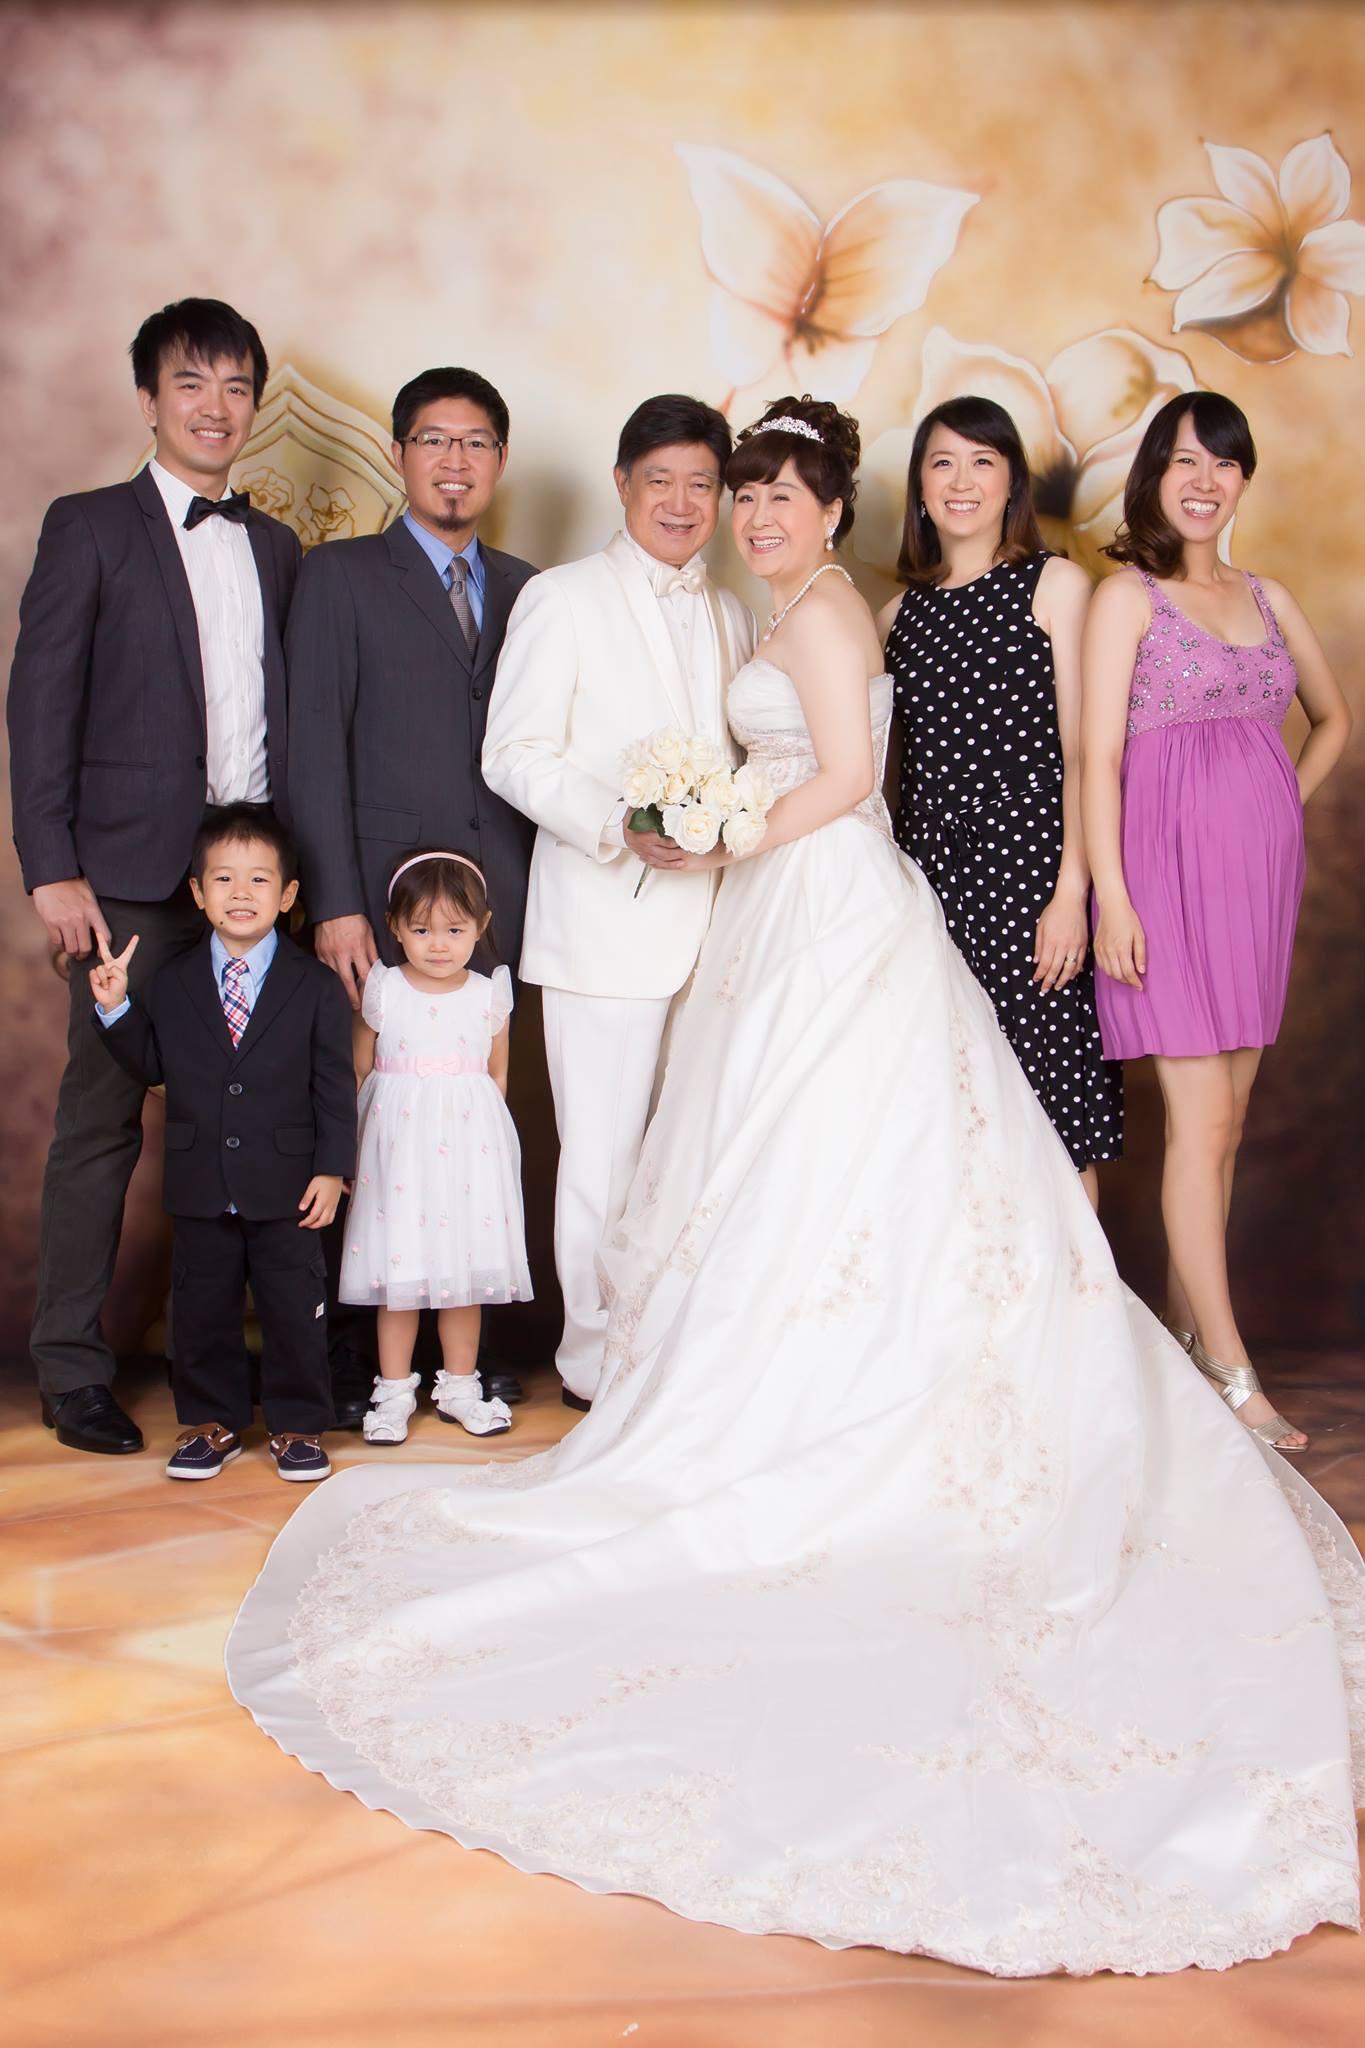 2015 全家福照 (2)